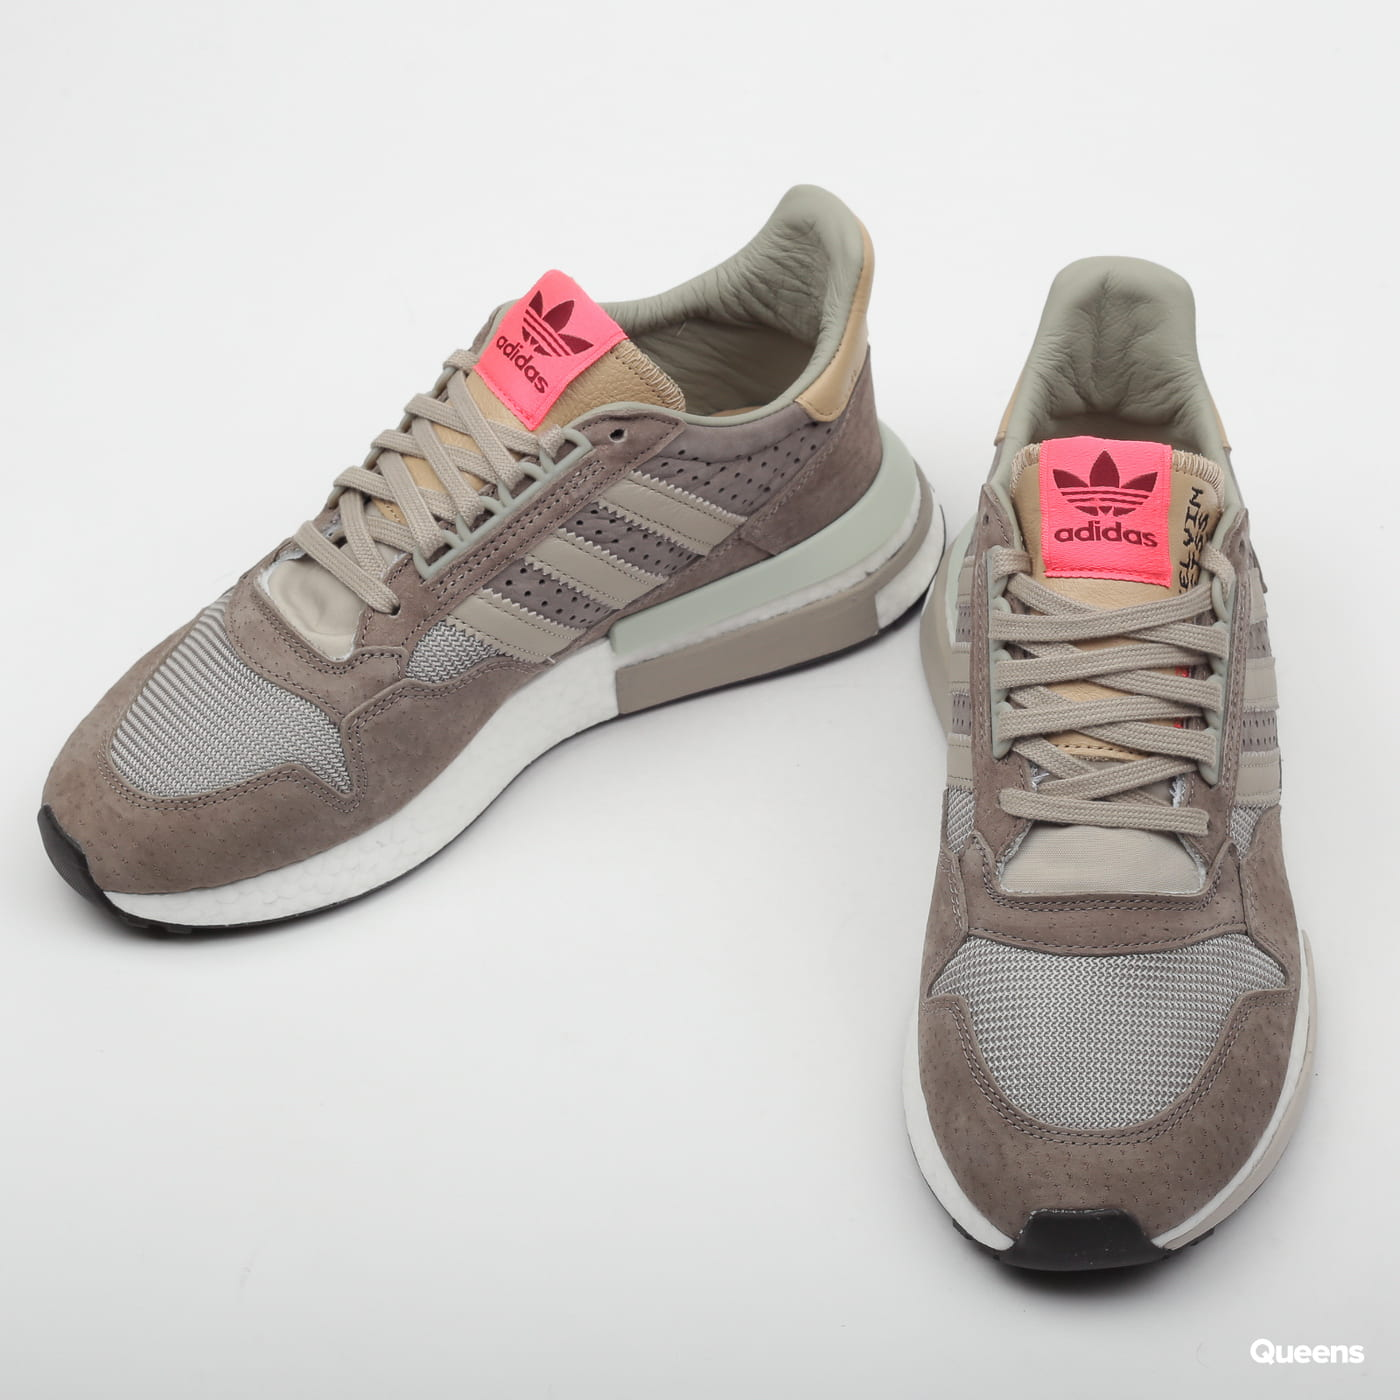 adidas Originals ZX 500 RM simbrown / lghbro / ftwwht